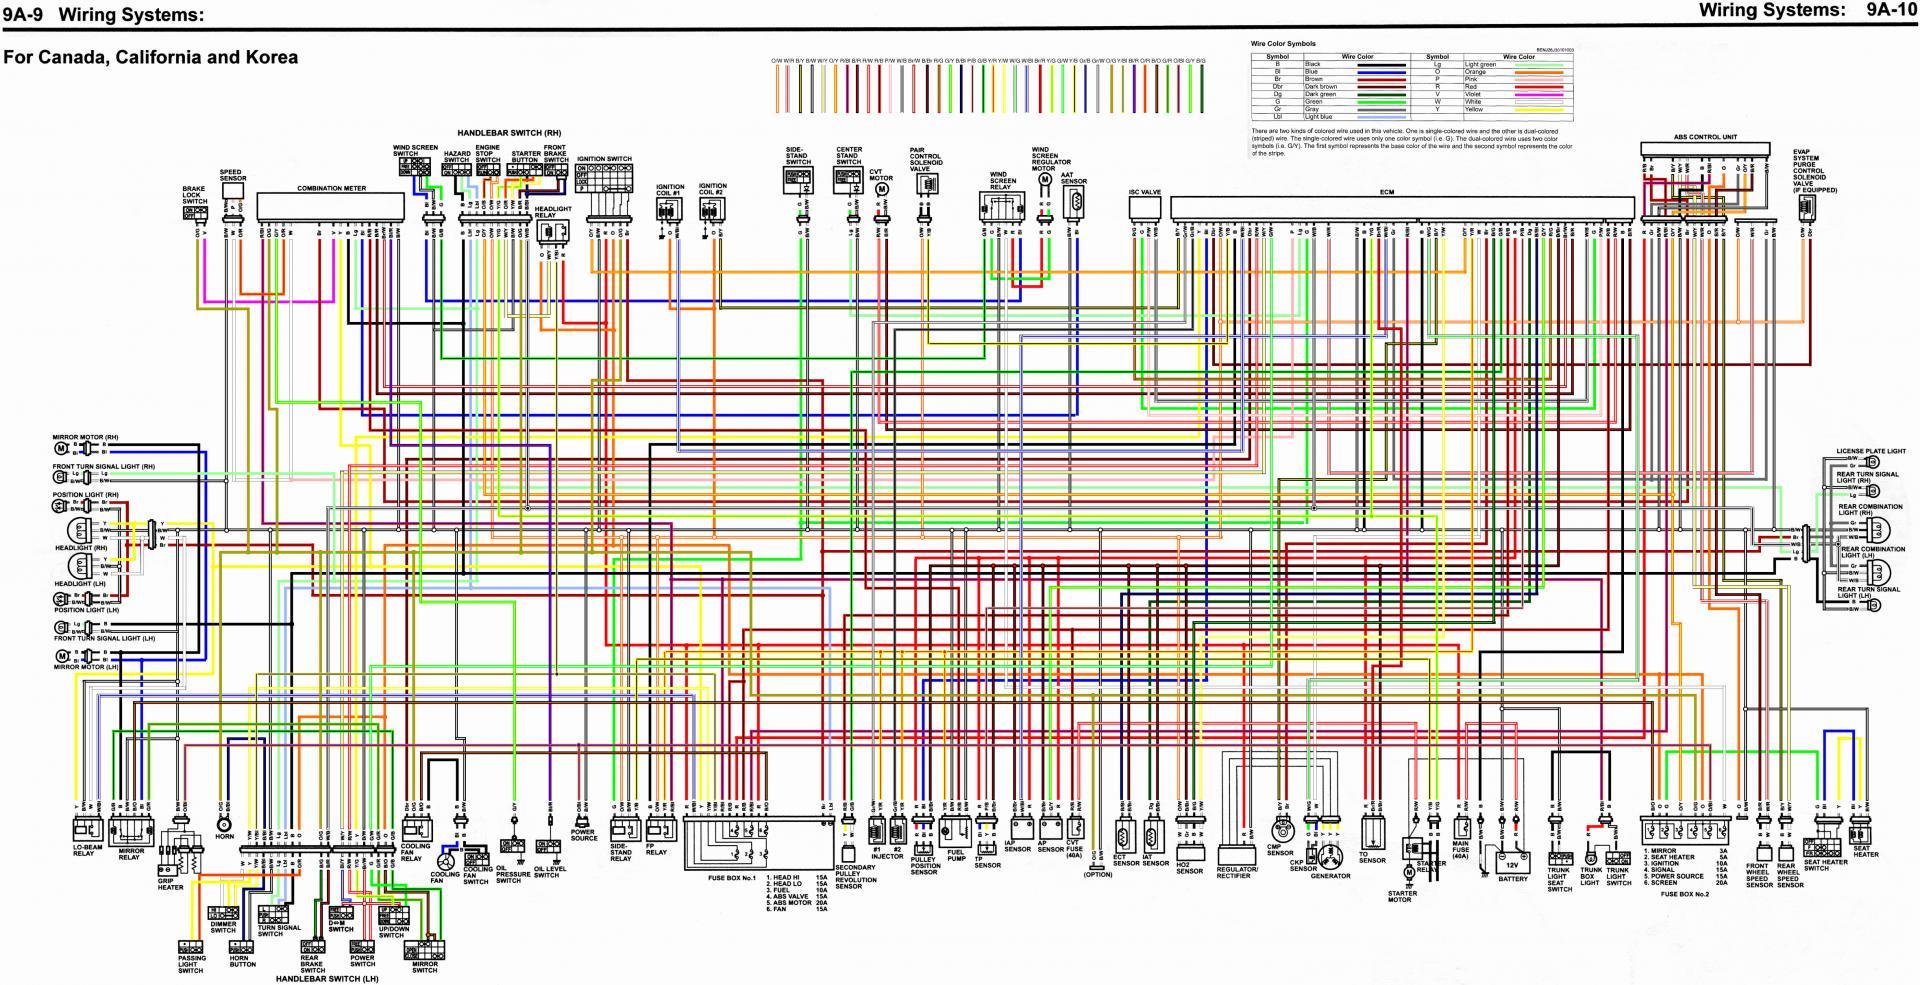 2018 burgman wiring diagram in color | suzuki burgman usa forum  burgman usa